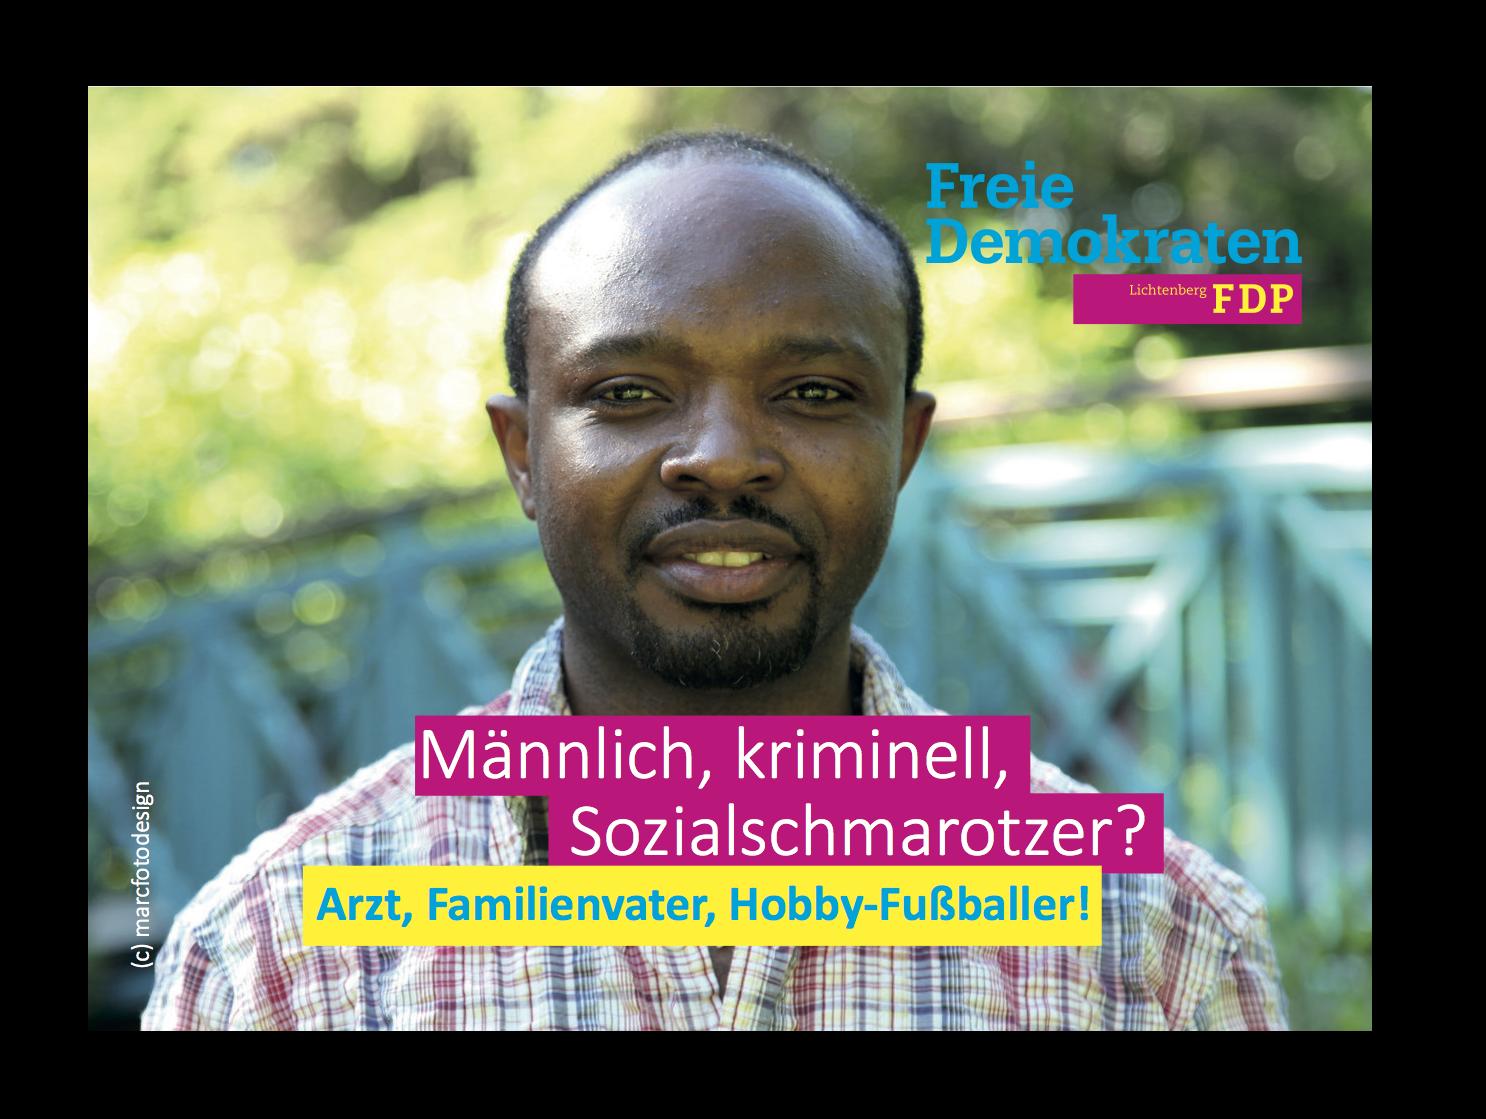 FDP Postkarte Flüchtlinge